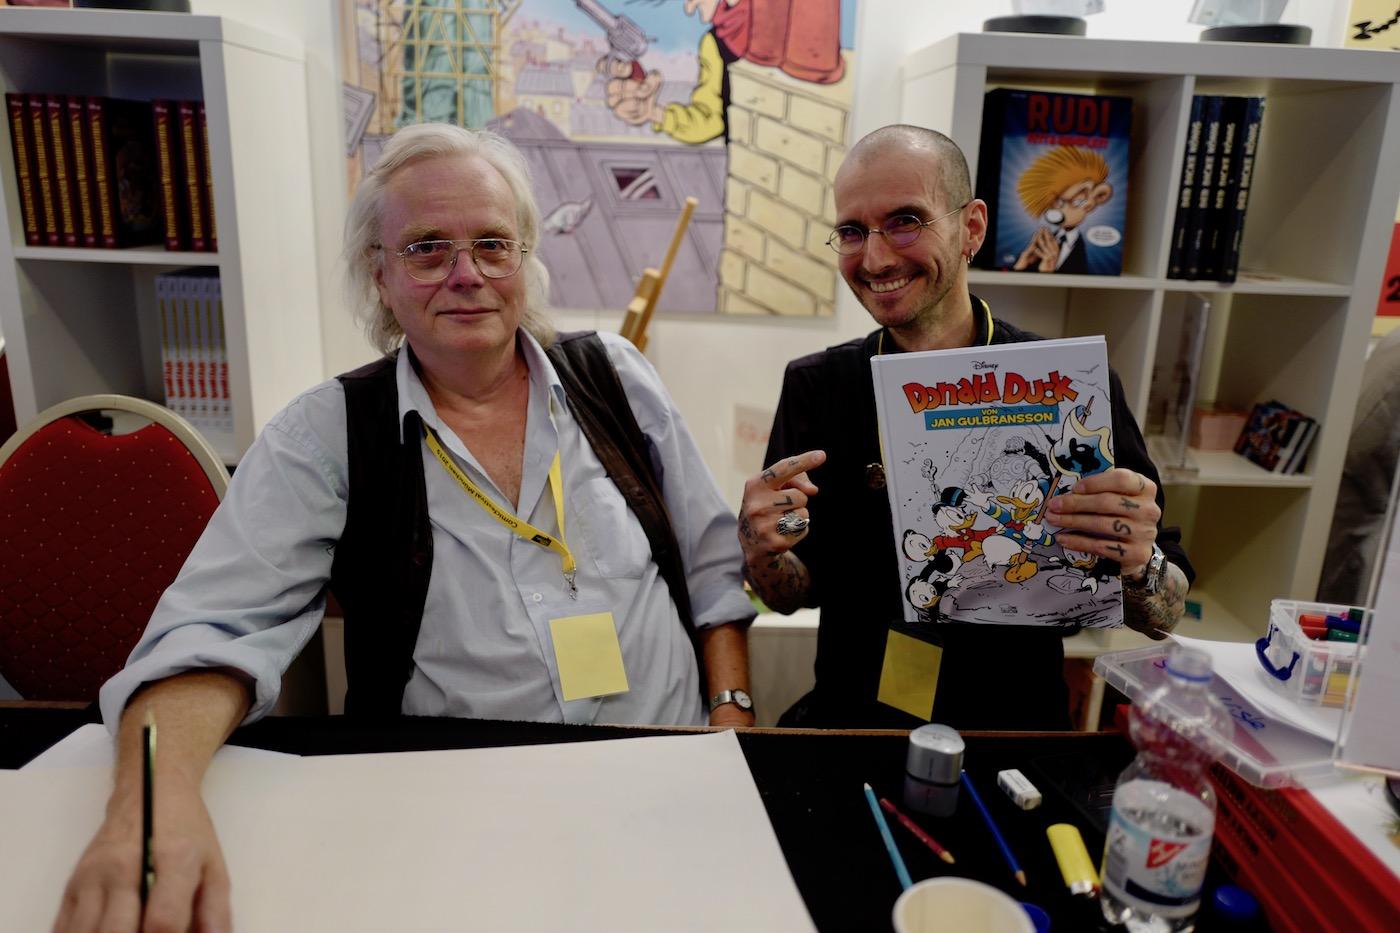 mark_benecke_comic_festival_muenchen_munich_comic_con_2019 - 78.jpg